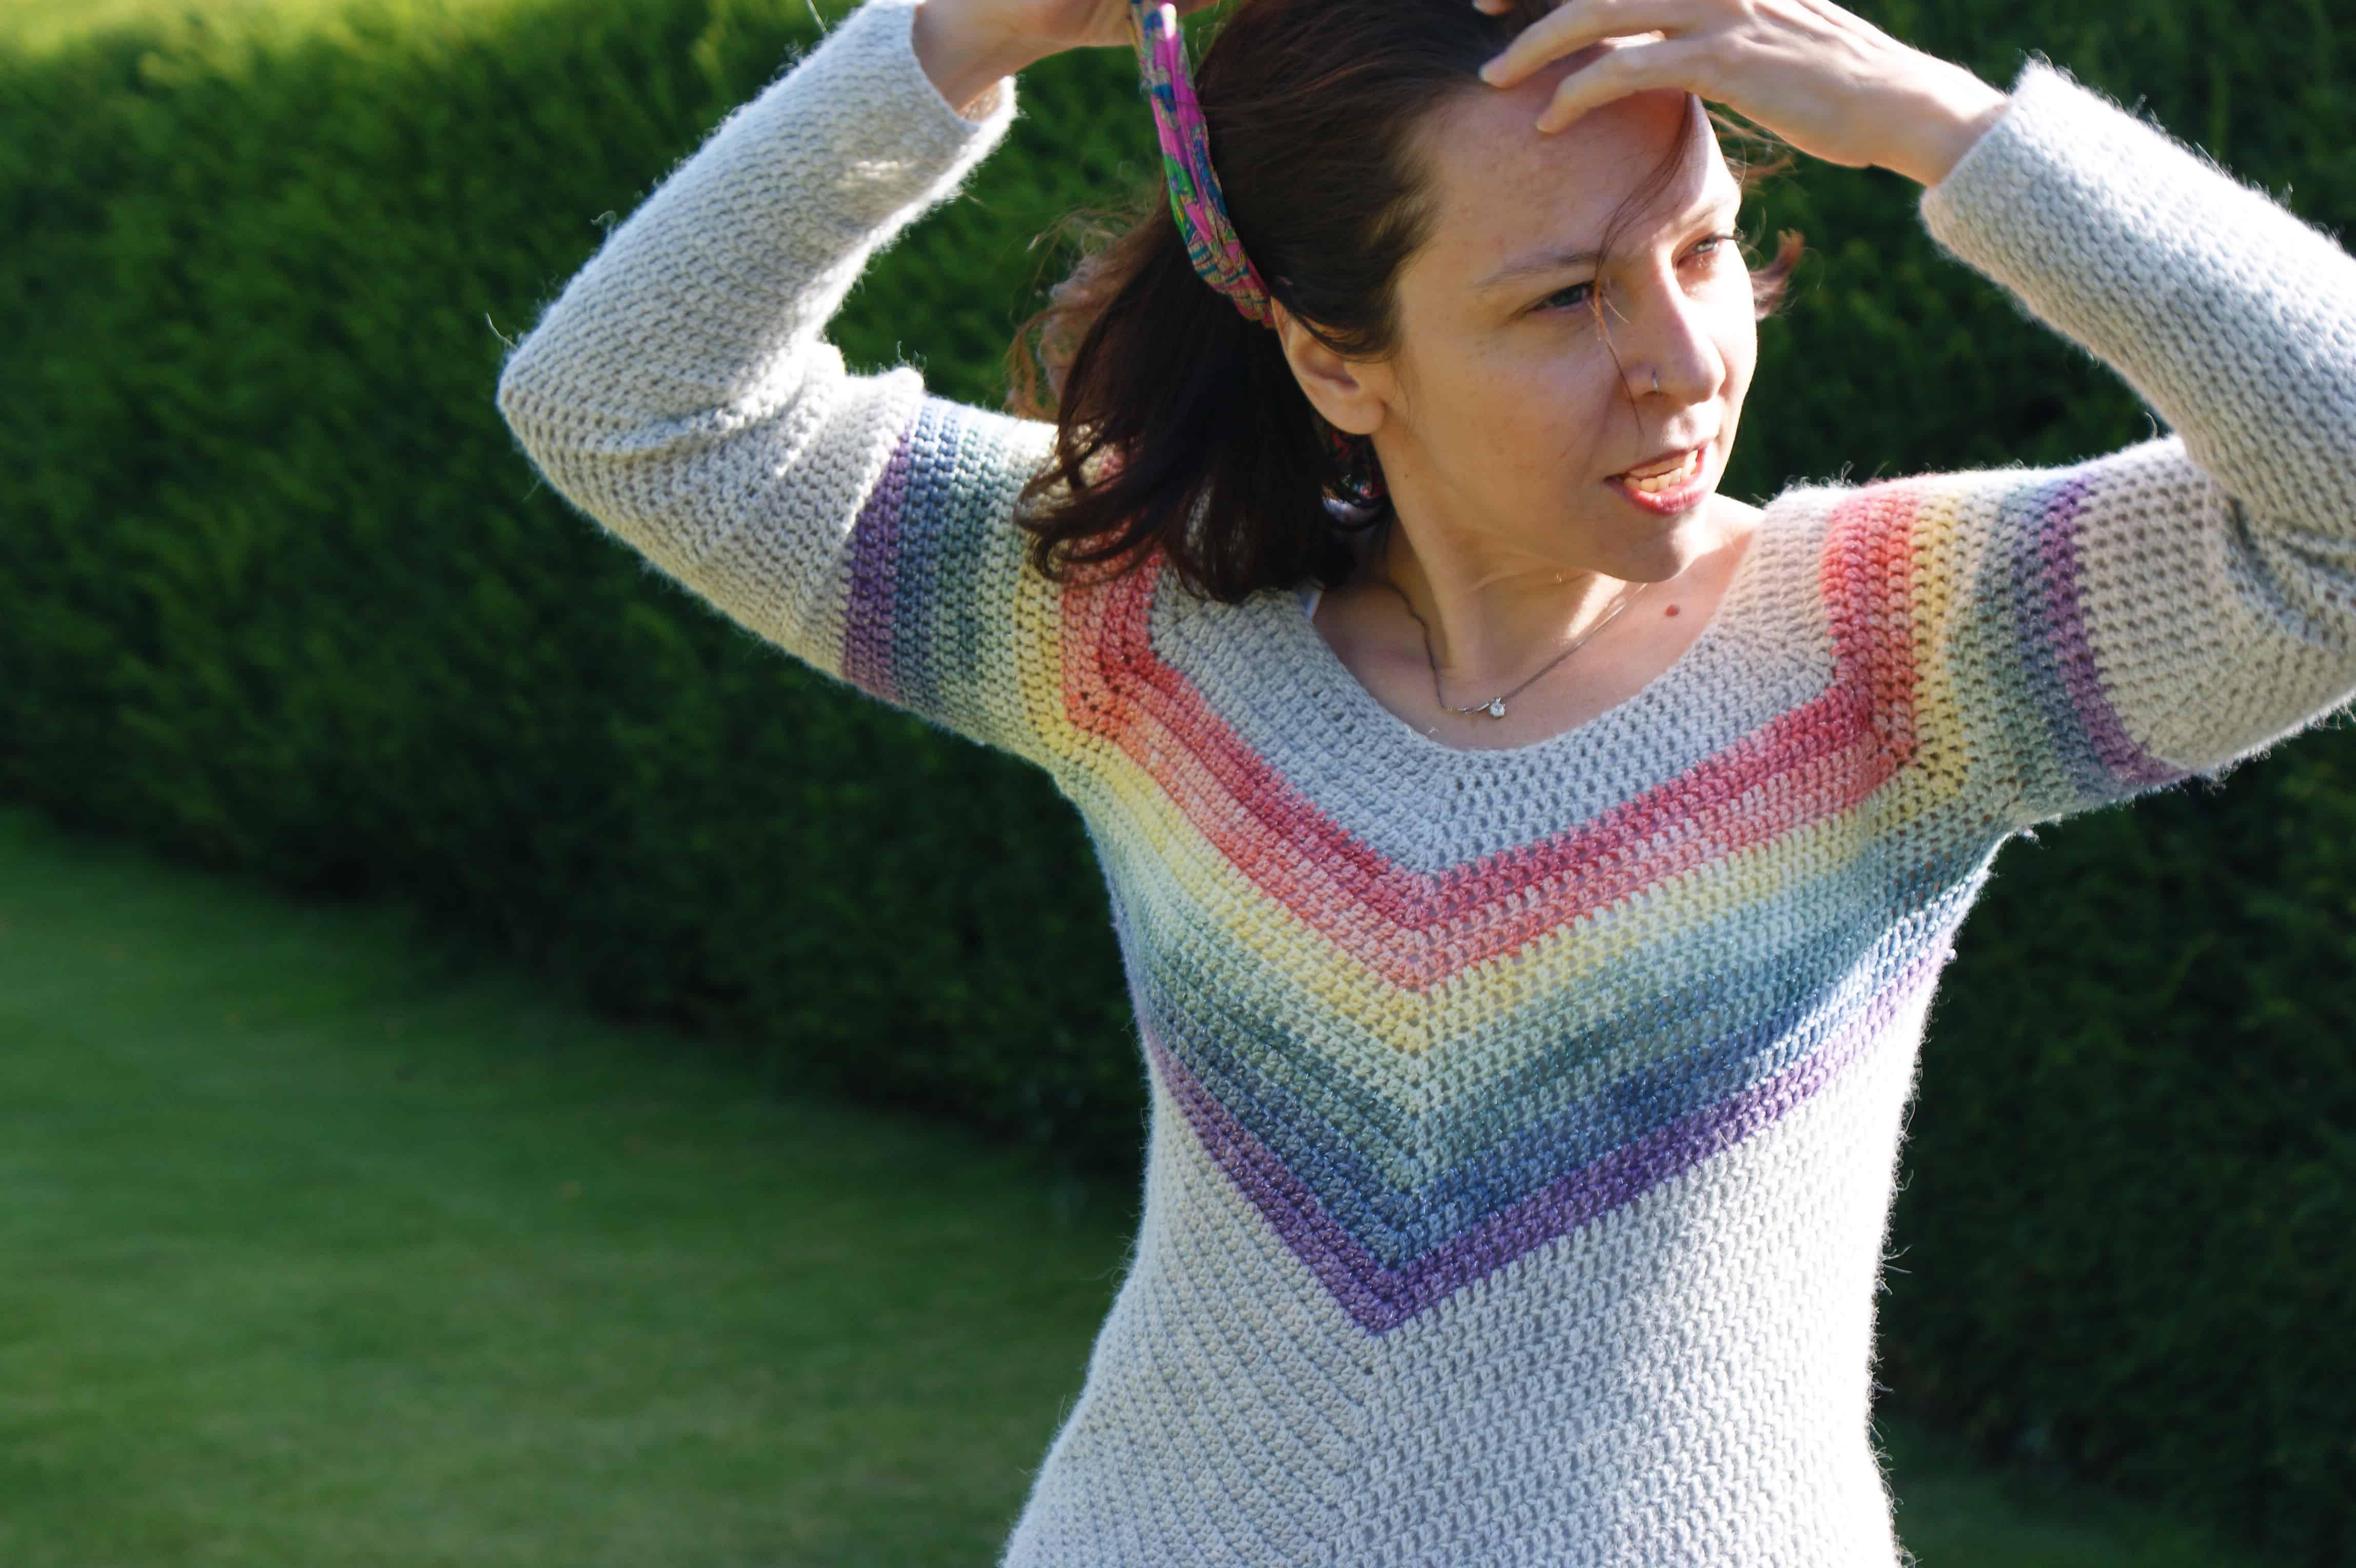 Woman in rainbow chevron crochet sweater in country garden